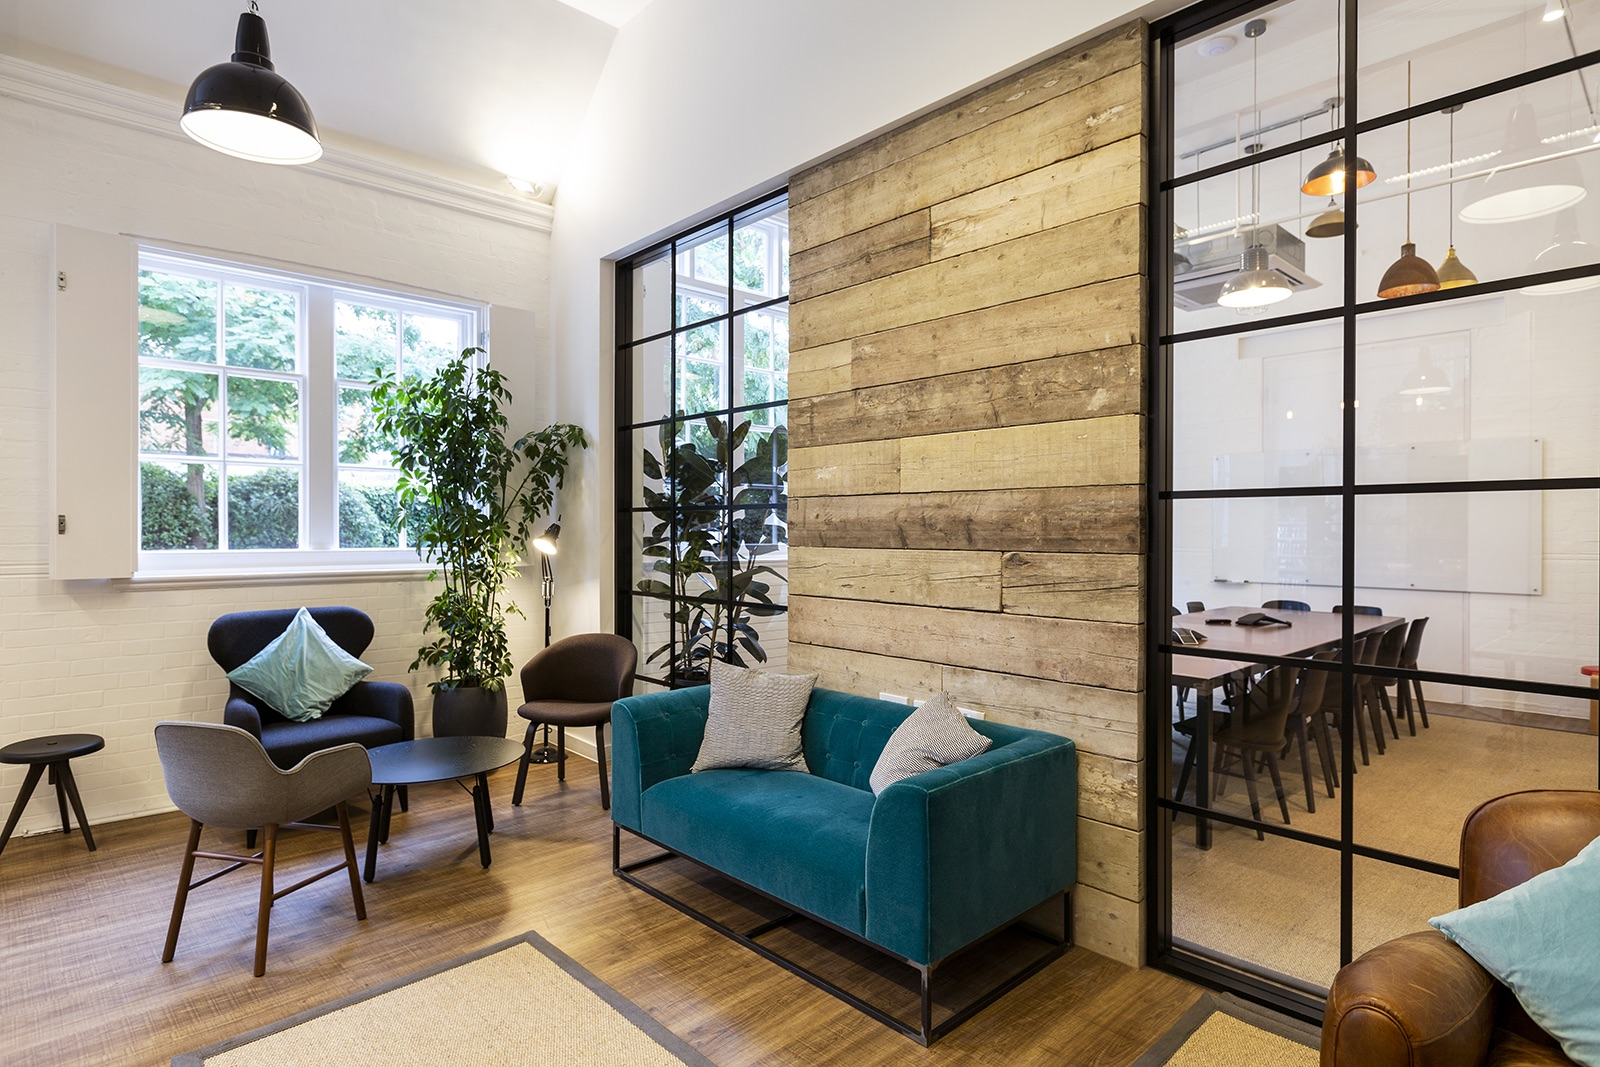 fevertree-office-london-5